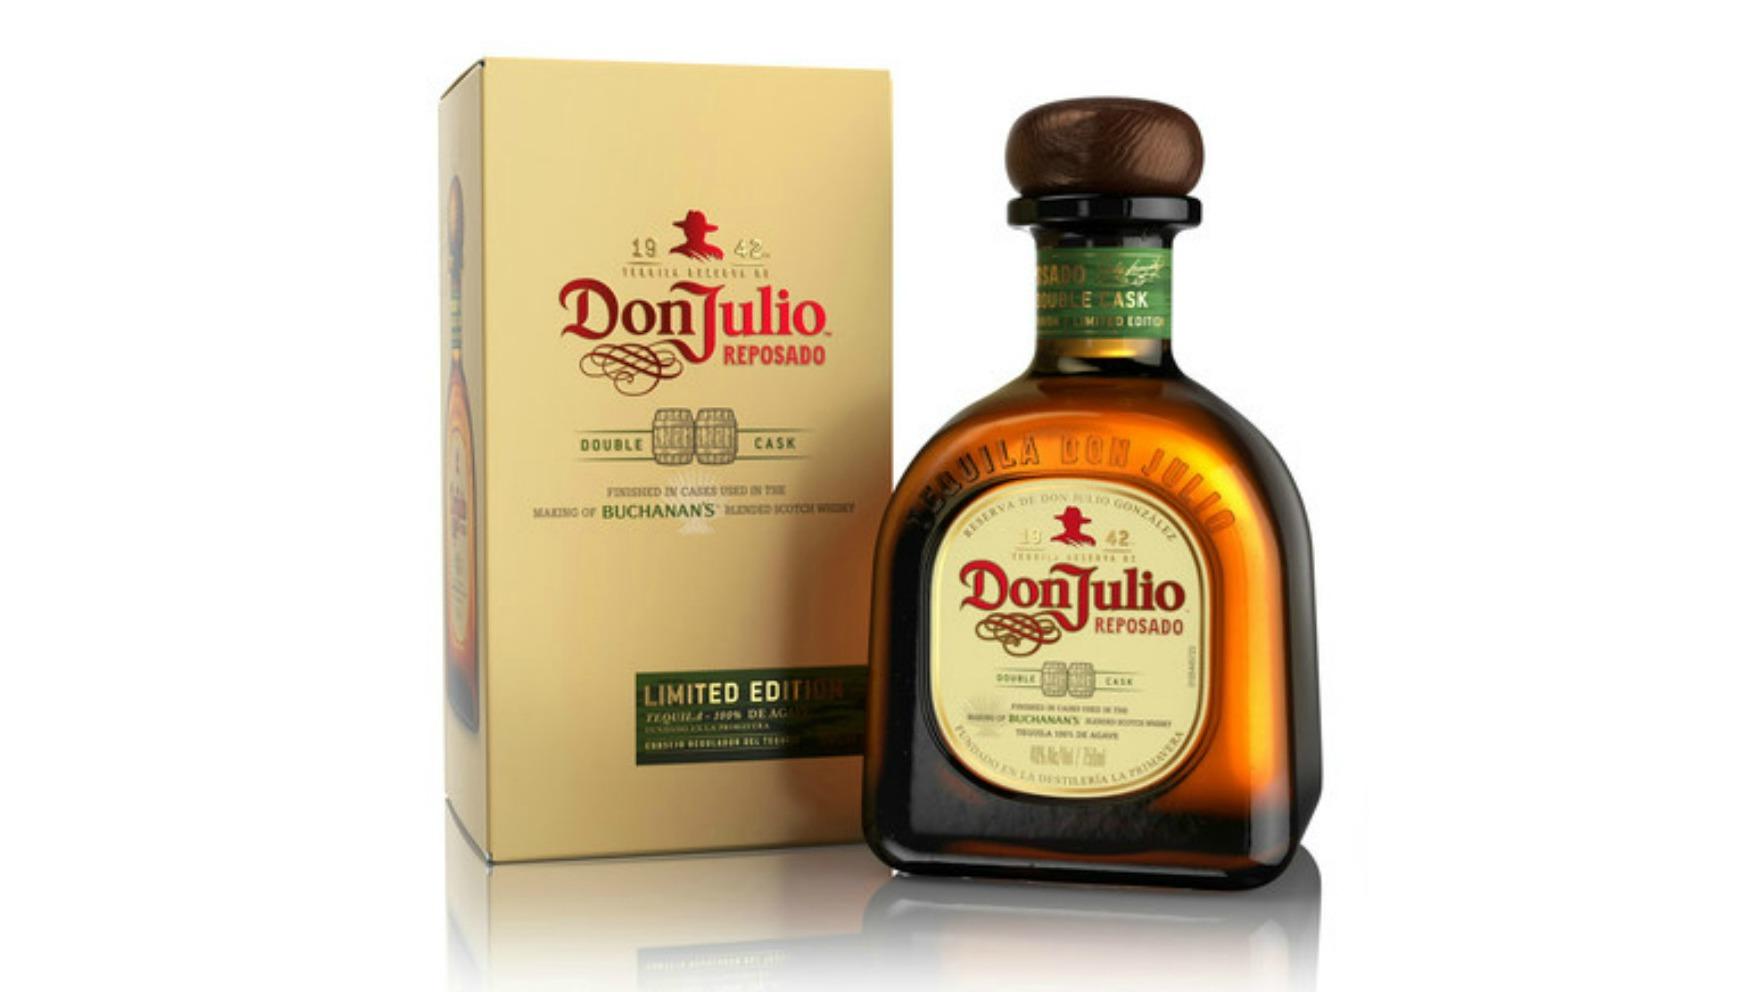 Don Julio Reposado, Double Cask